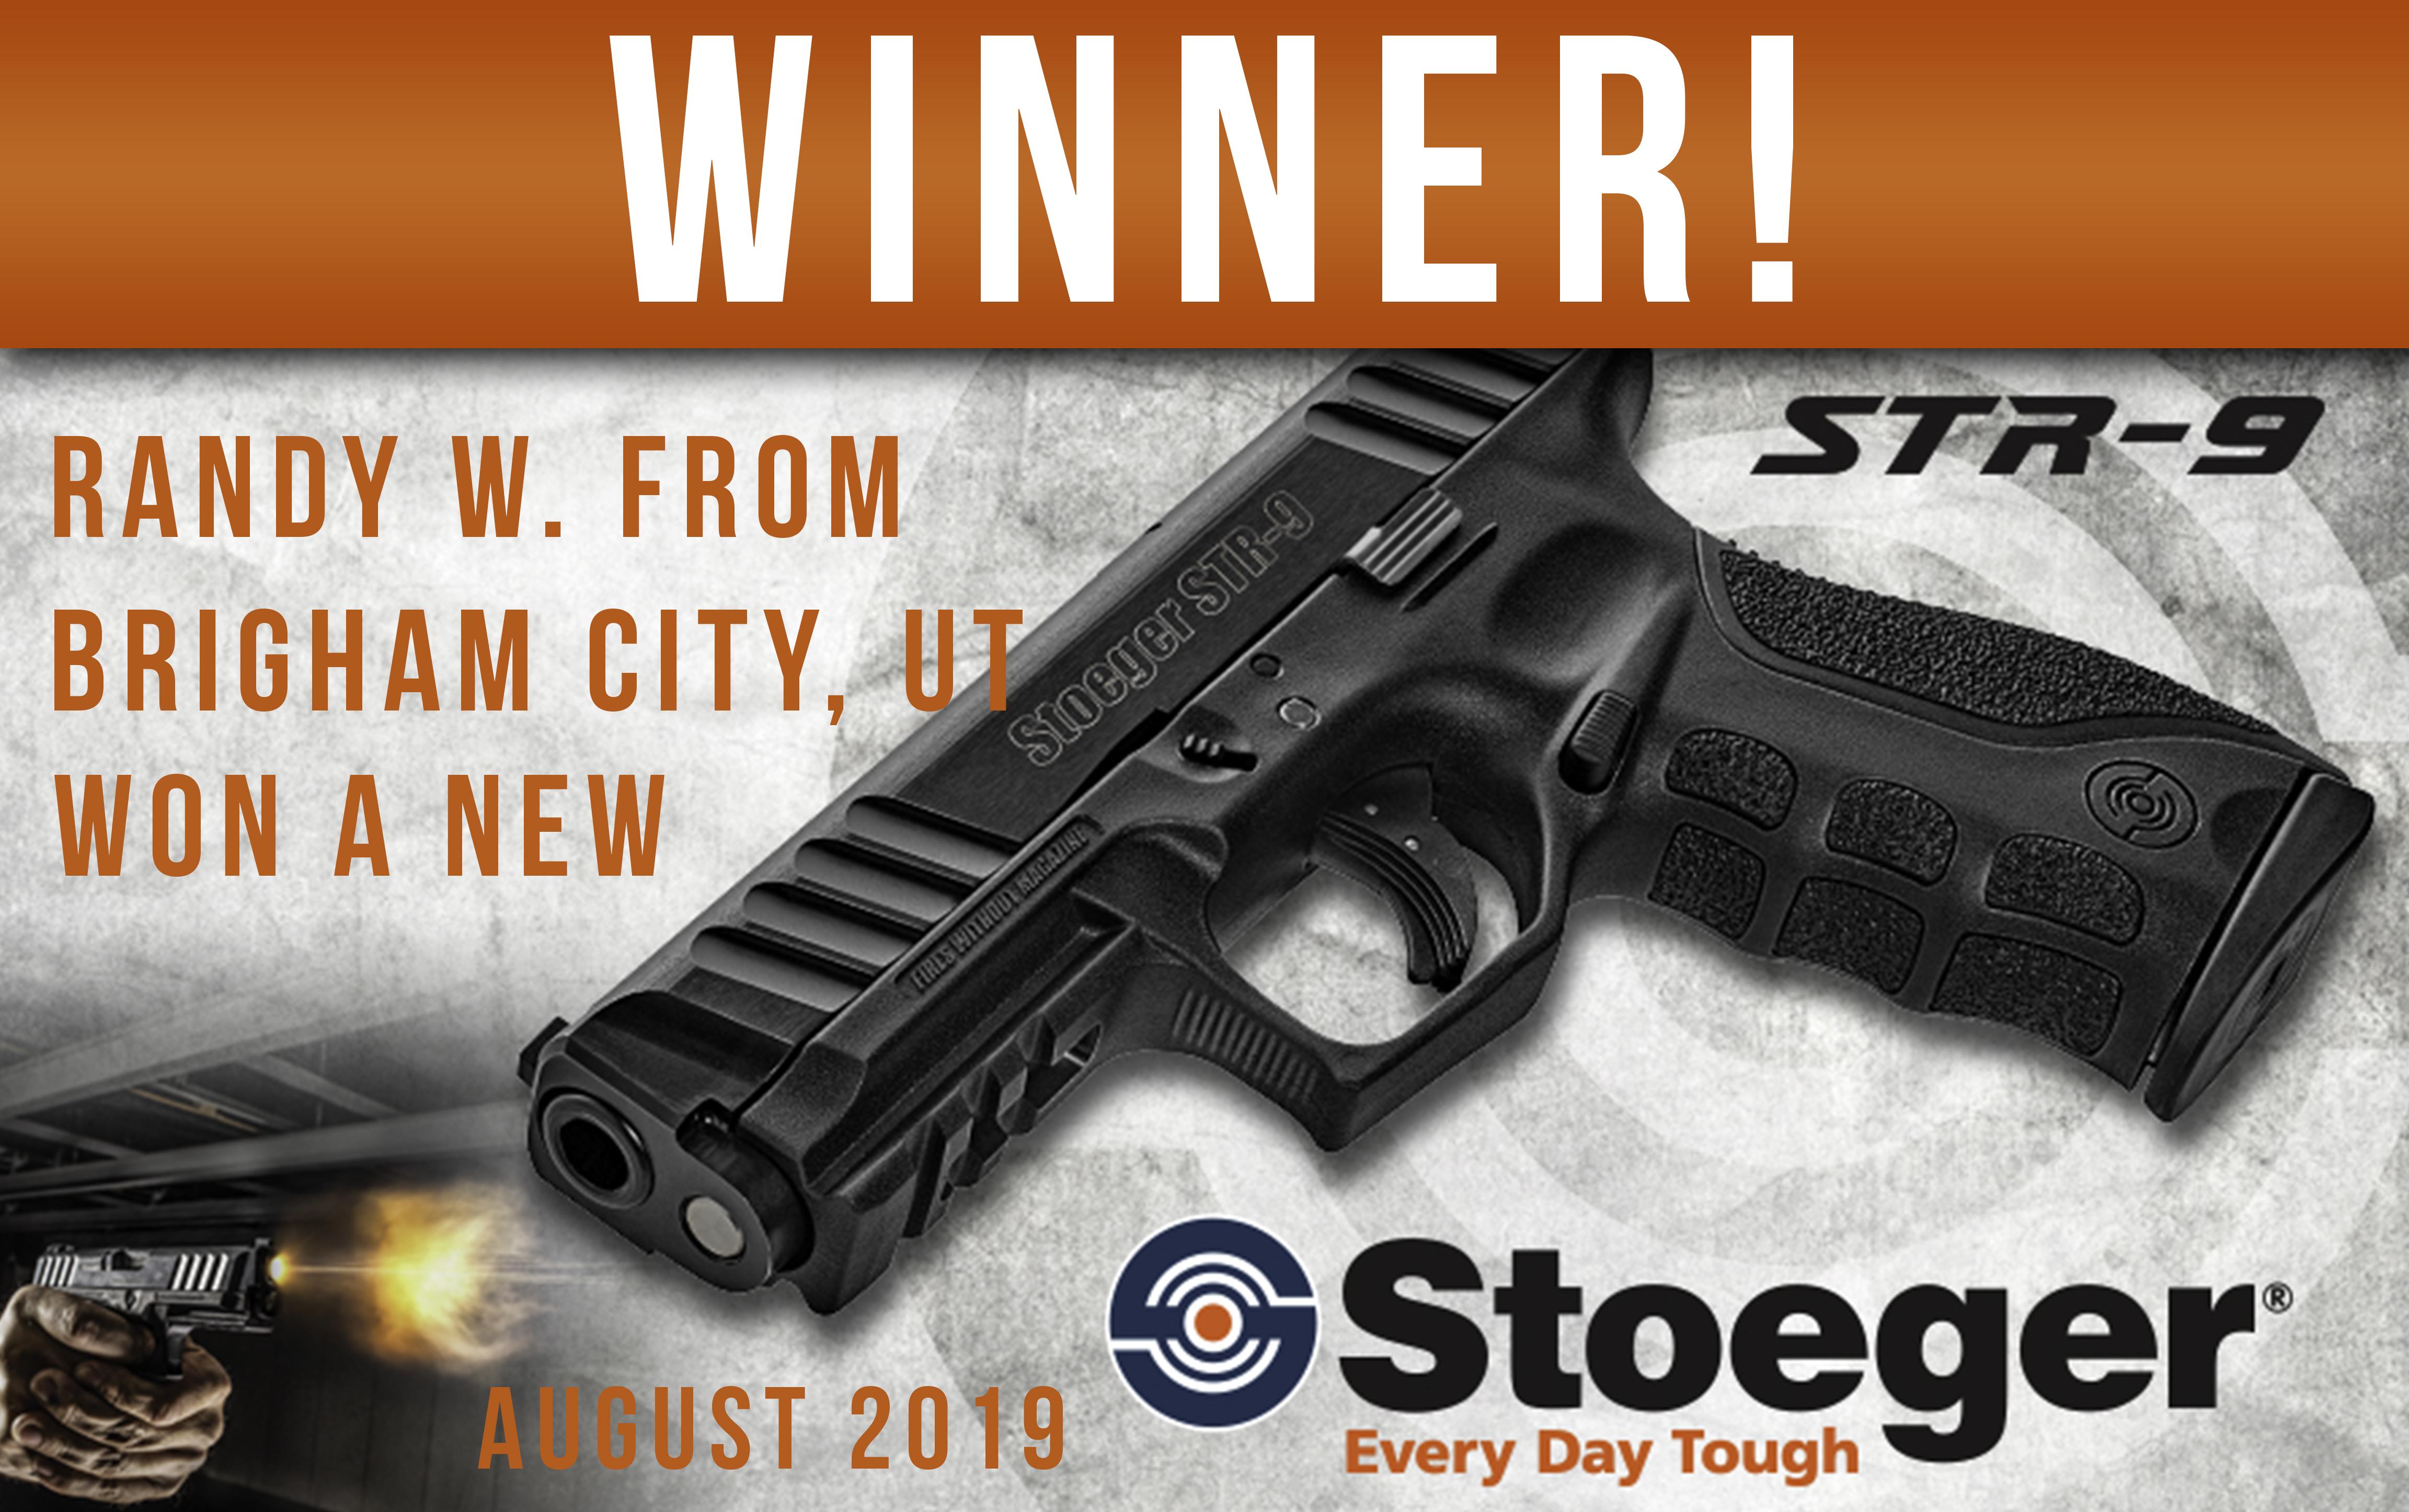 stoeger-str-9-giveaway-winner-2.jpg